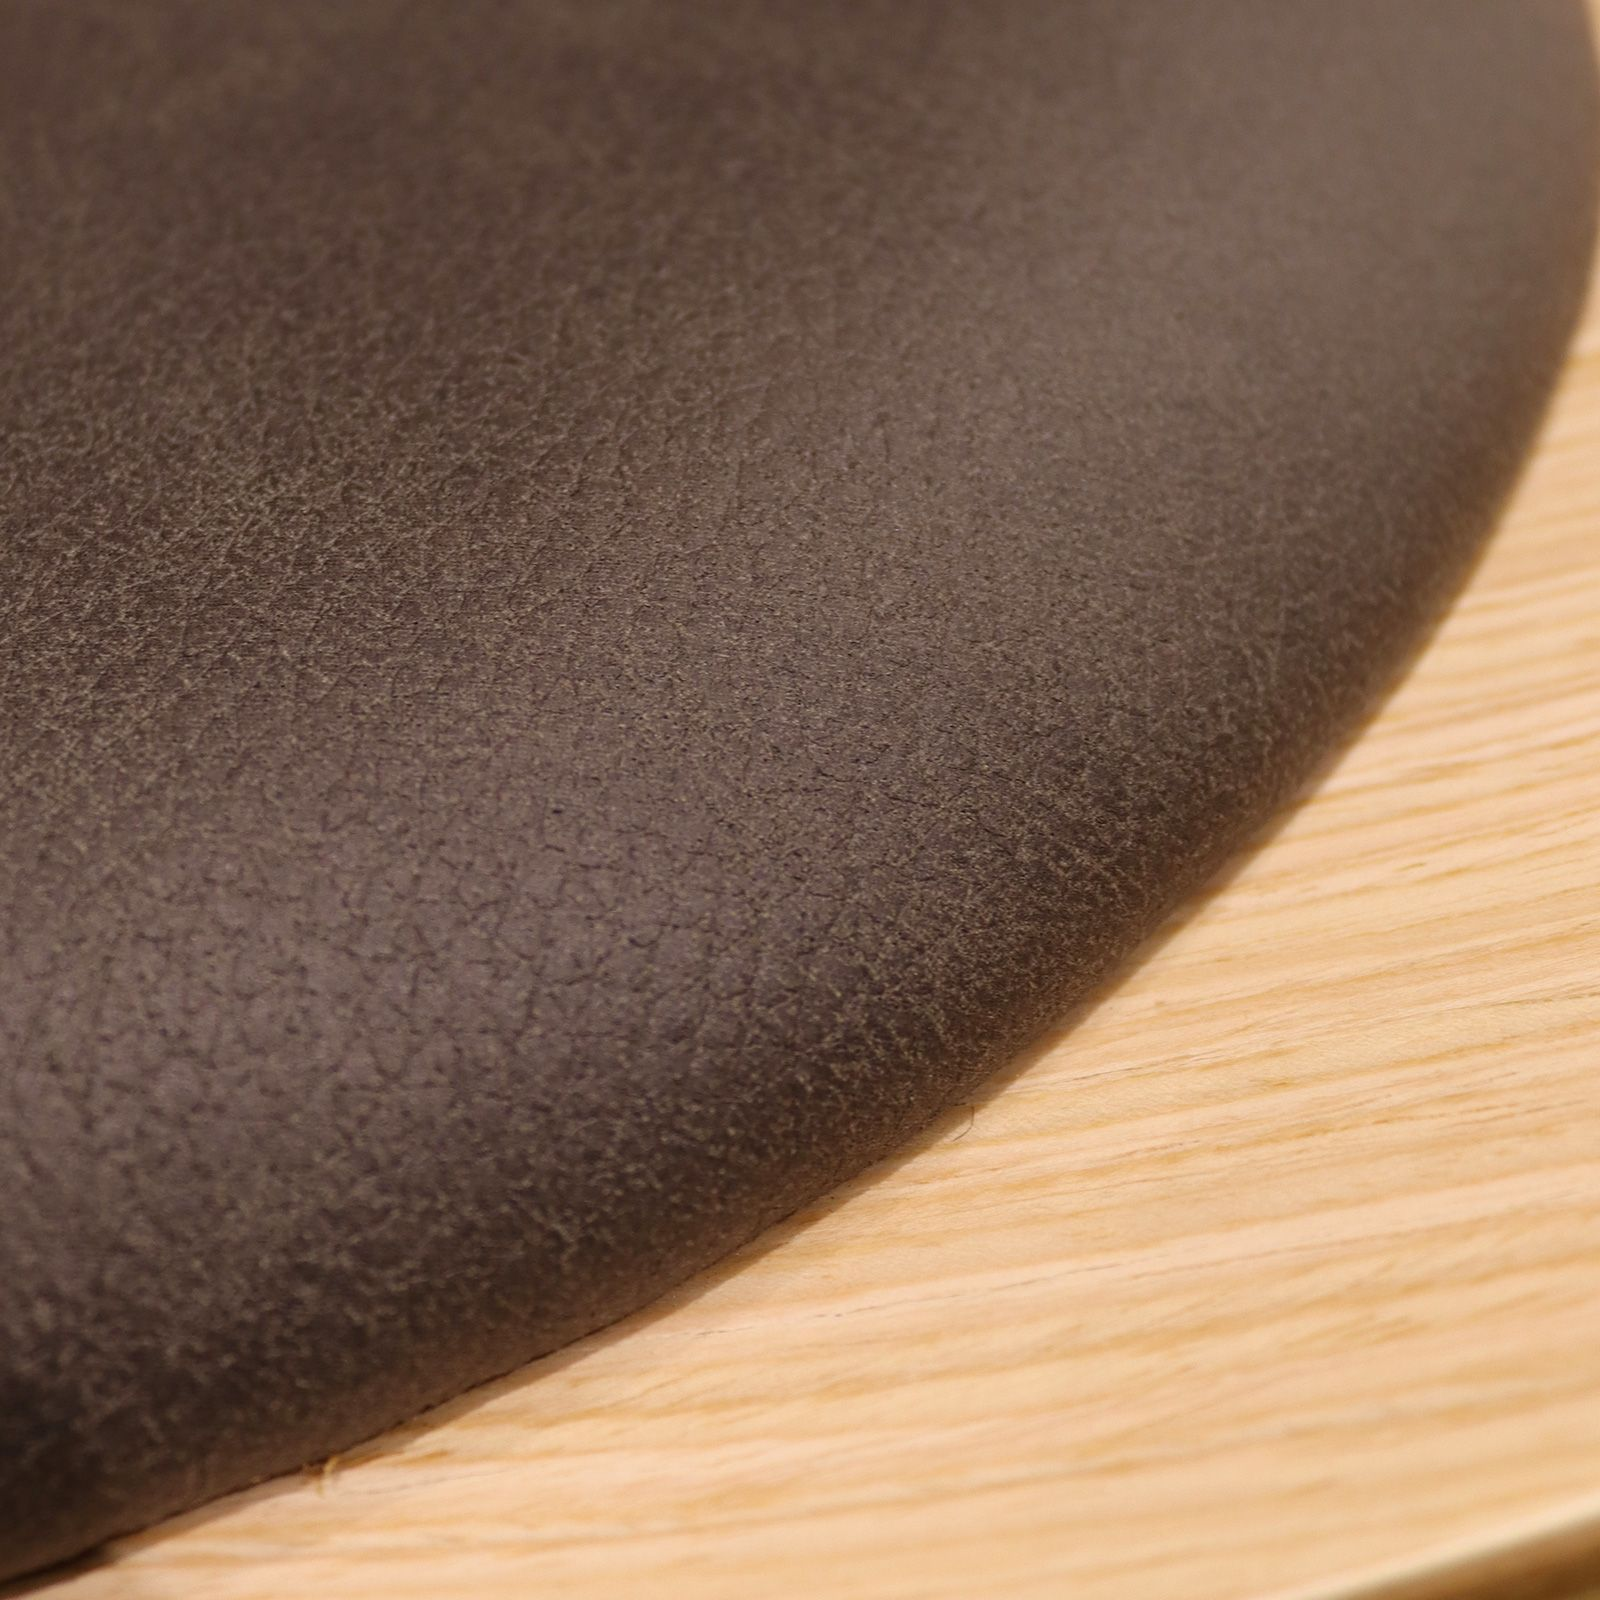 NICO   Butaca de madera contrachapada con cojín gris oscuro (82 x 89 x 74 cm)